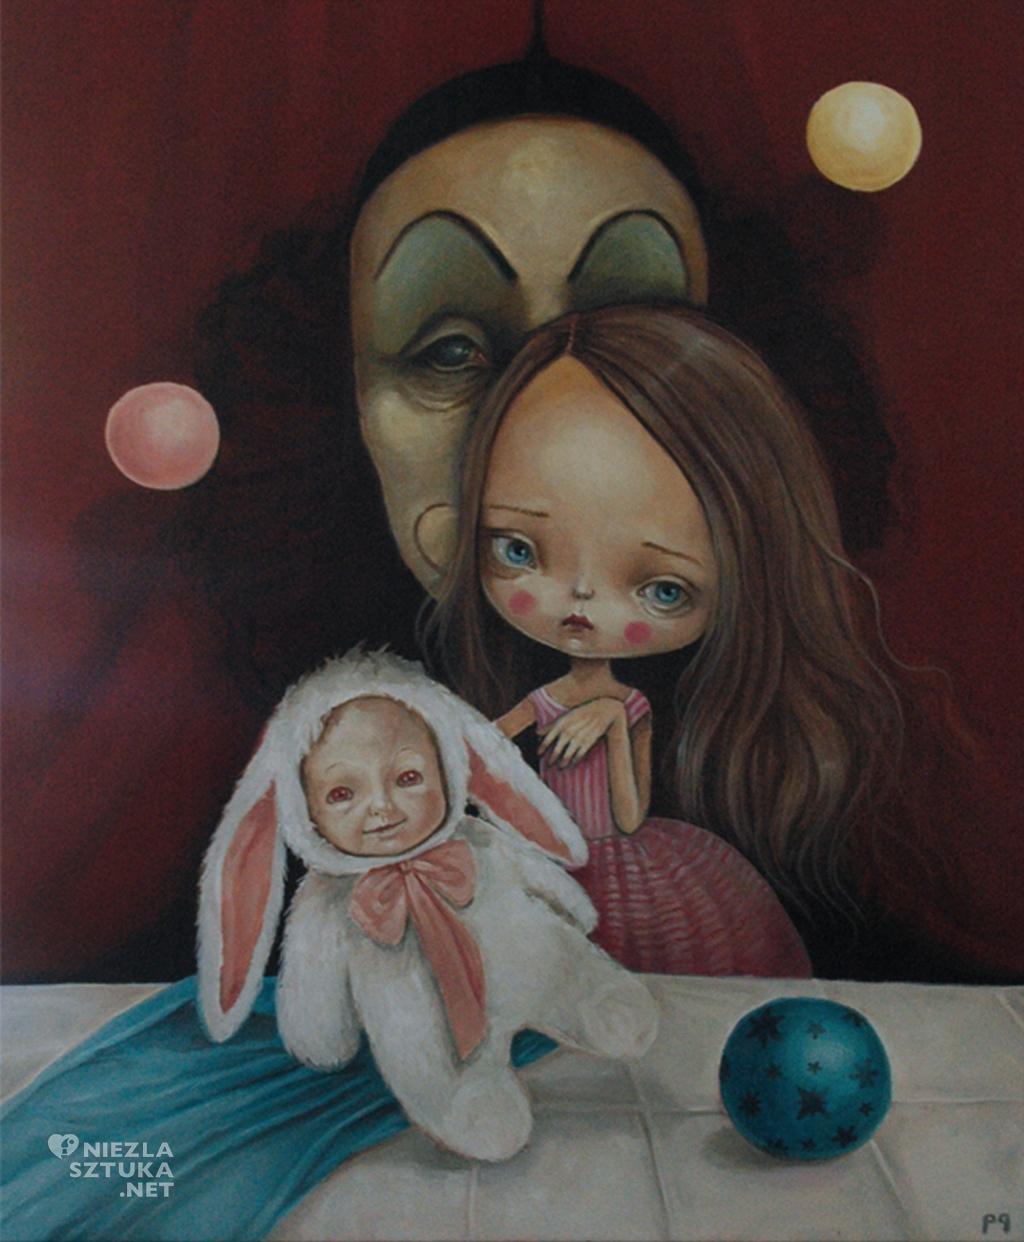 circus__the_magic_bunny_by_paulee1-d7mkgmu